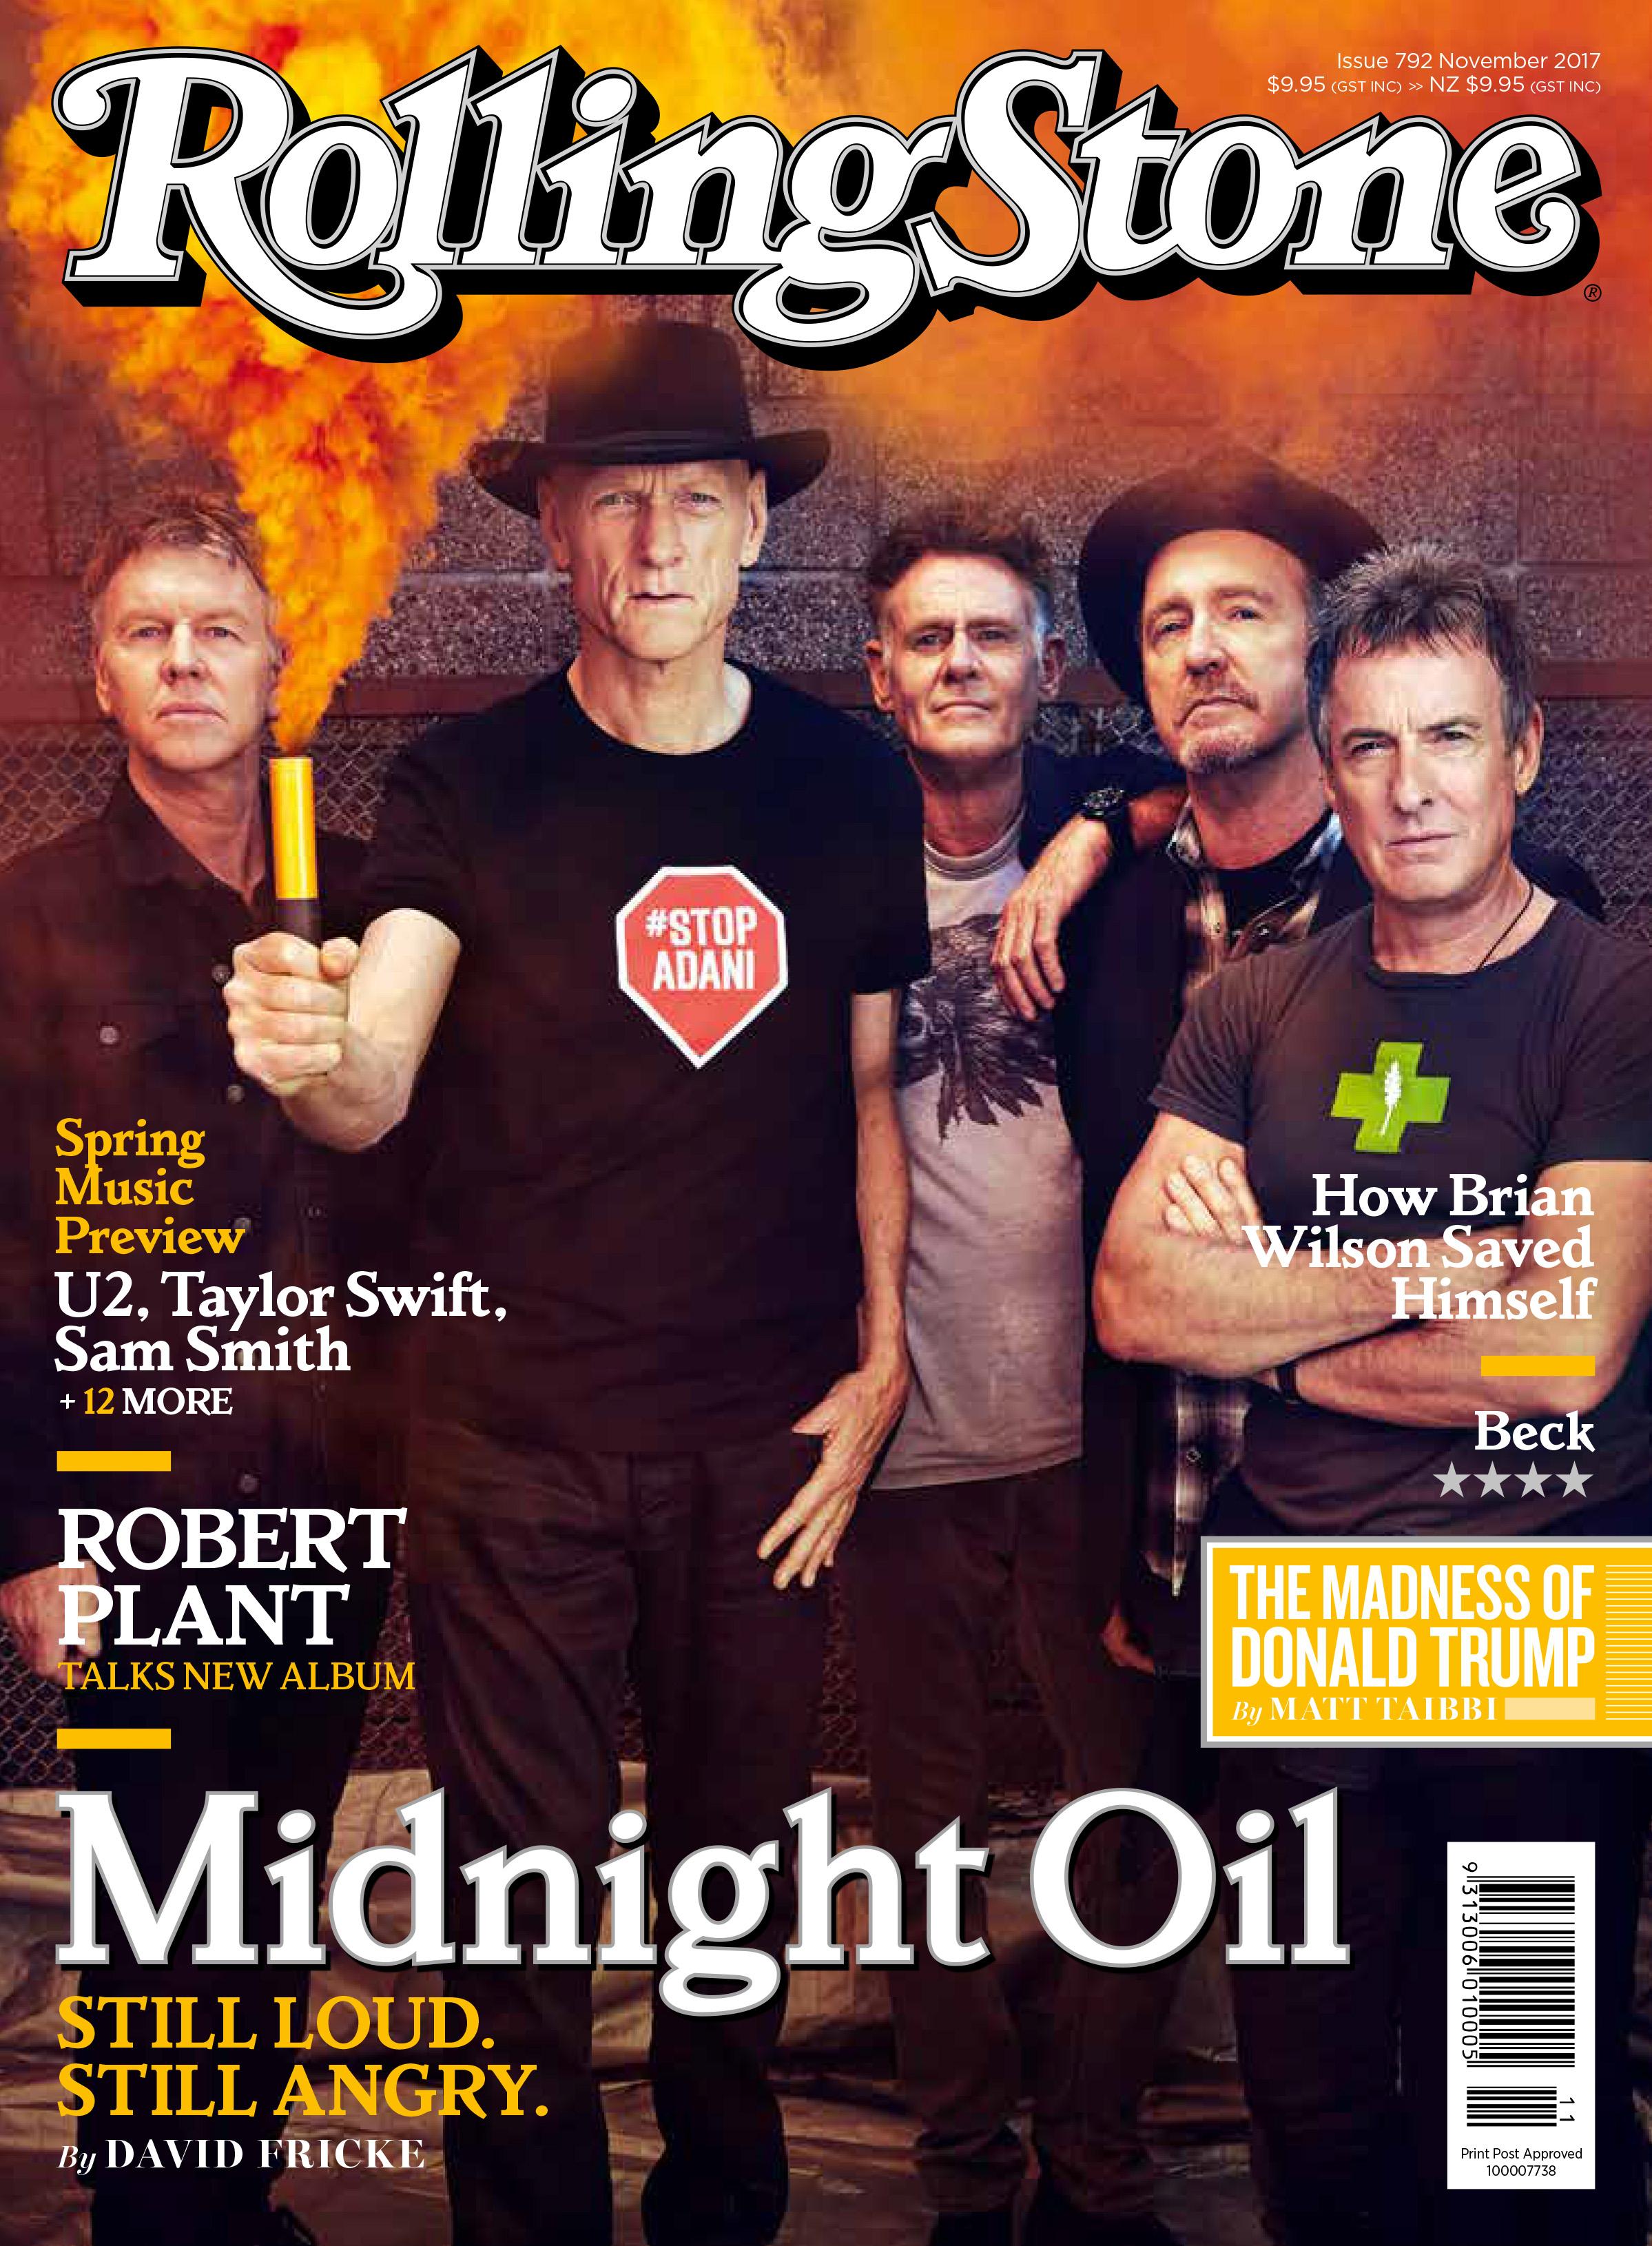 MIDNIGHT OIL, RollingStone, photo John Tsiavis 2